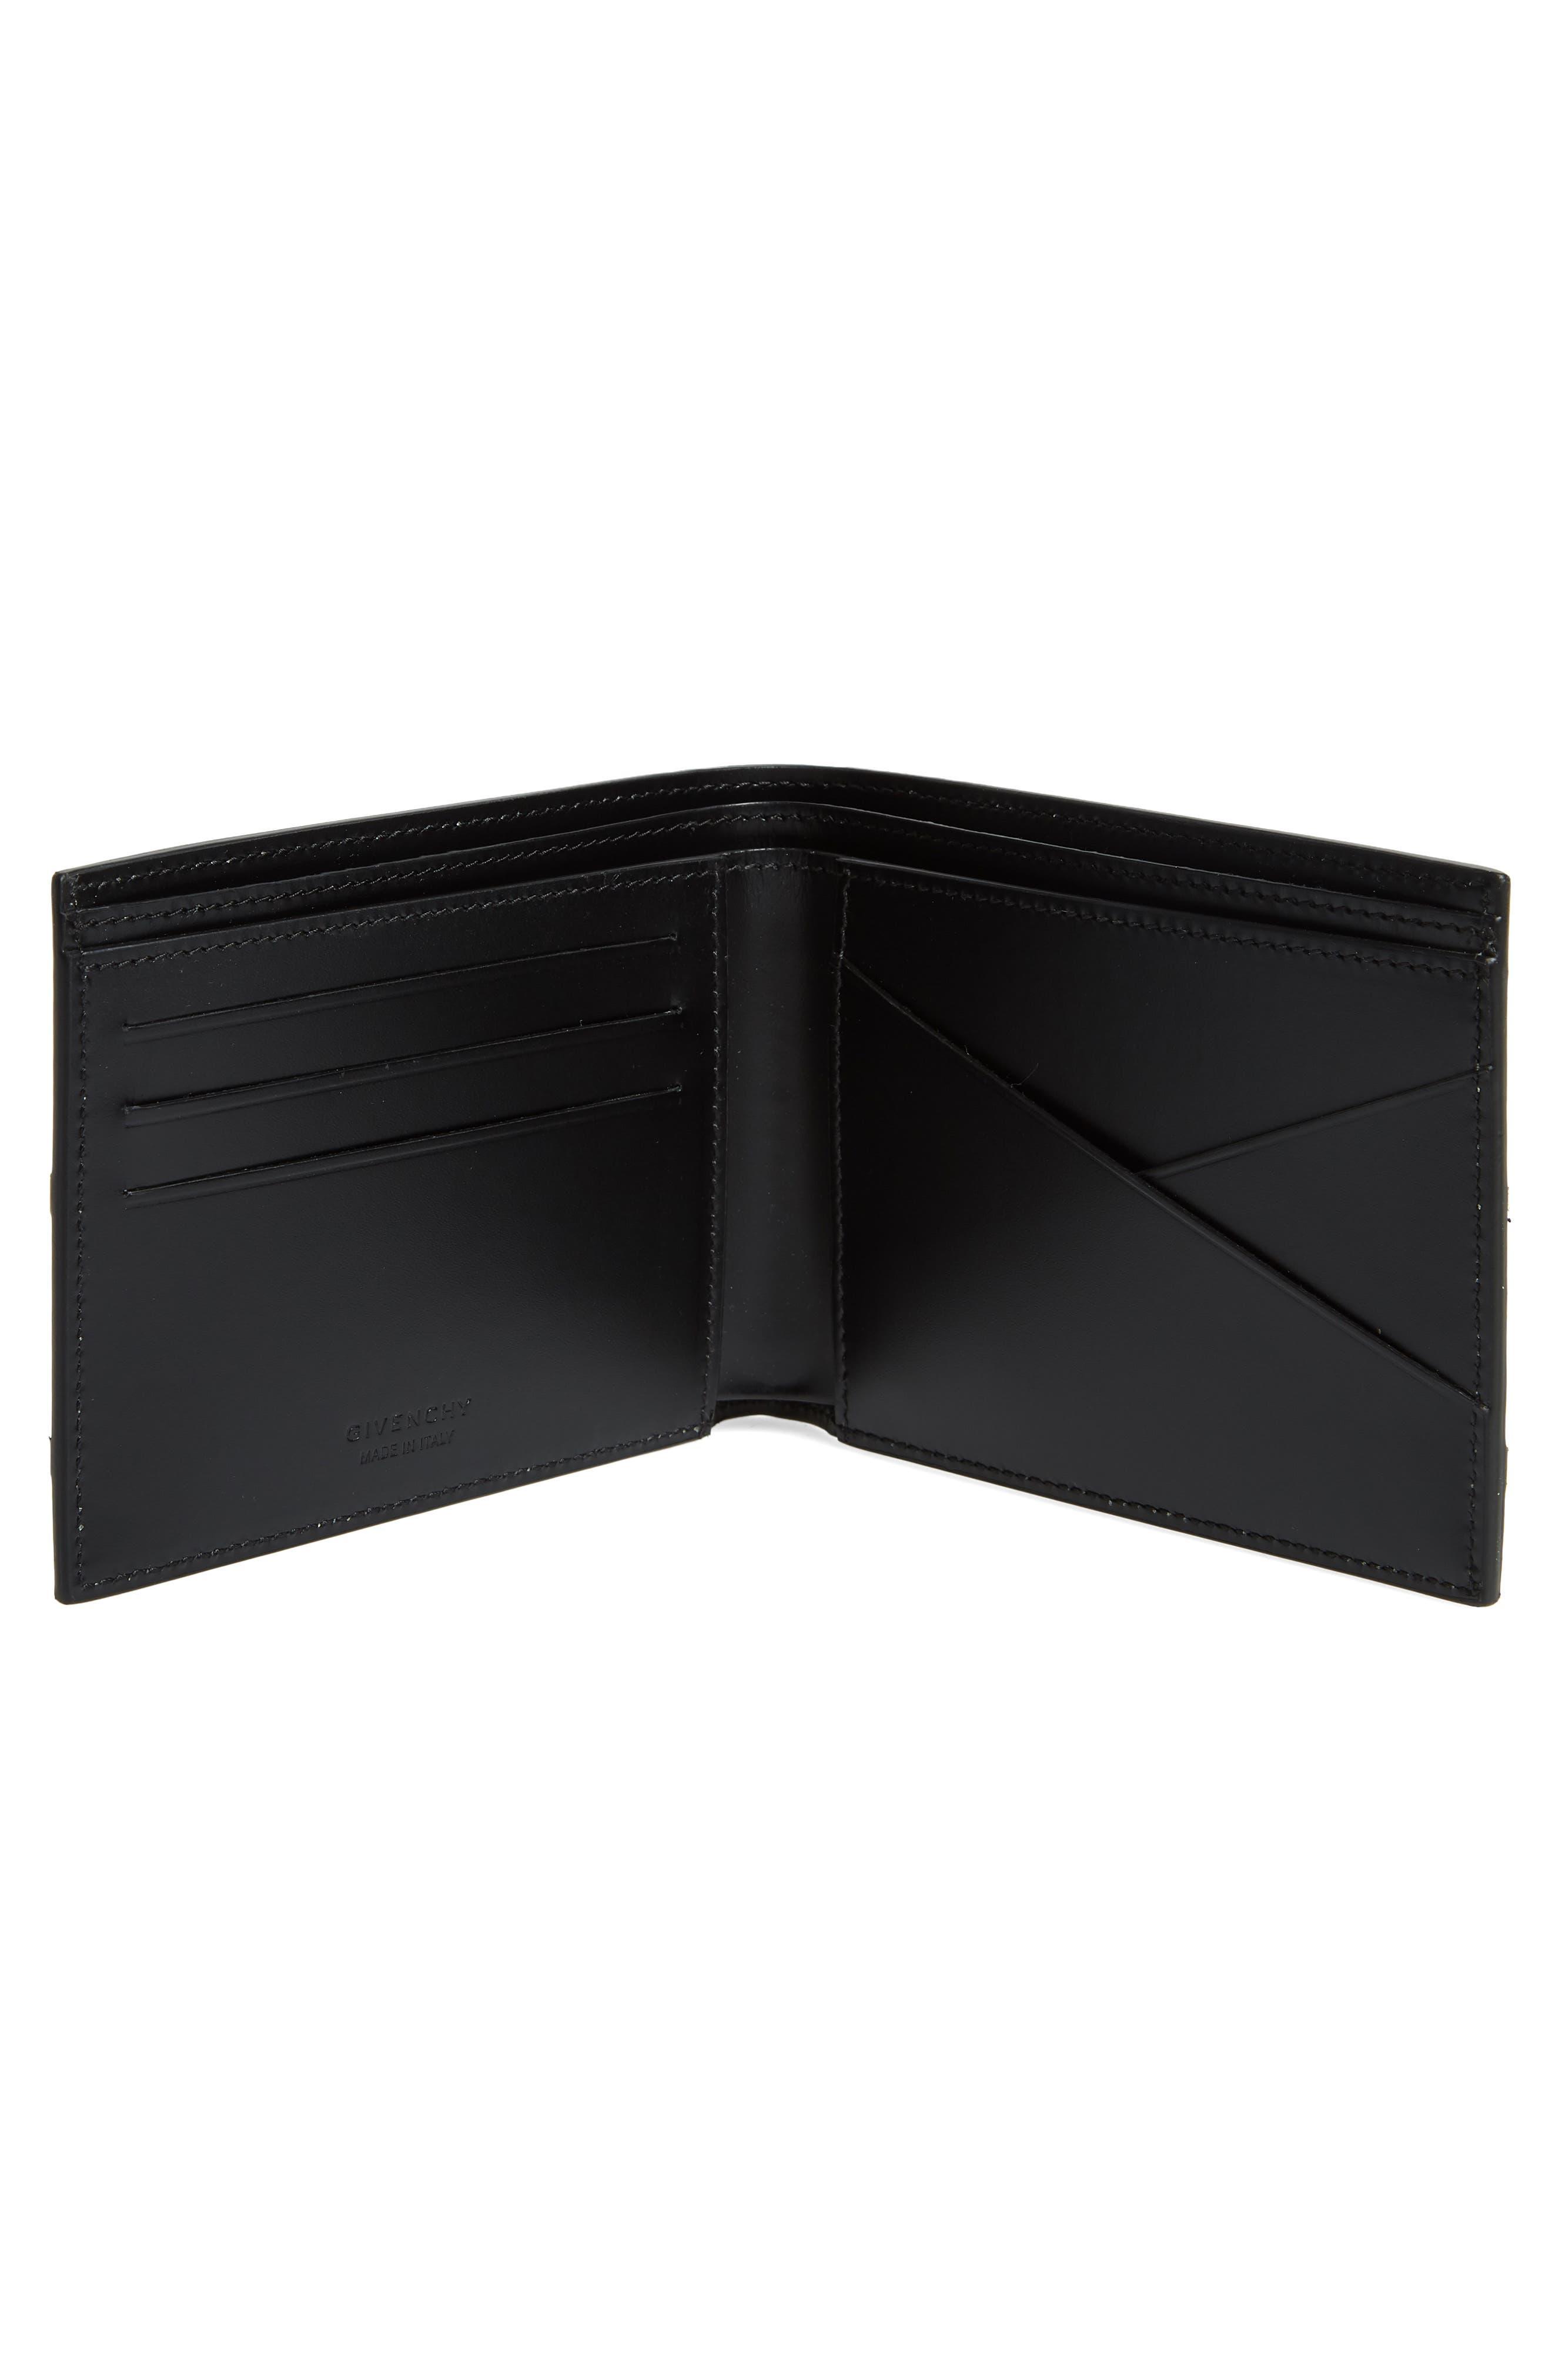 Reverse Logo Band Leather Wallet,                             Alternate thumbnail 2, color,                             BLACK/ WHITE